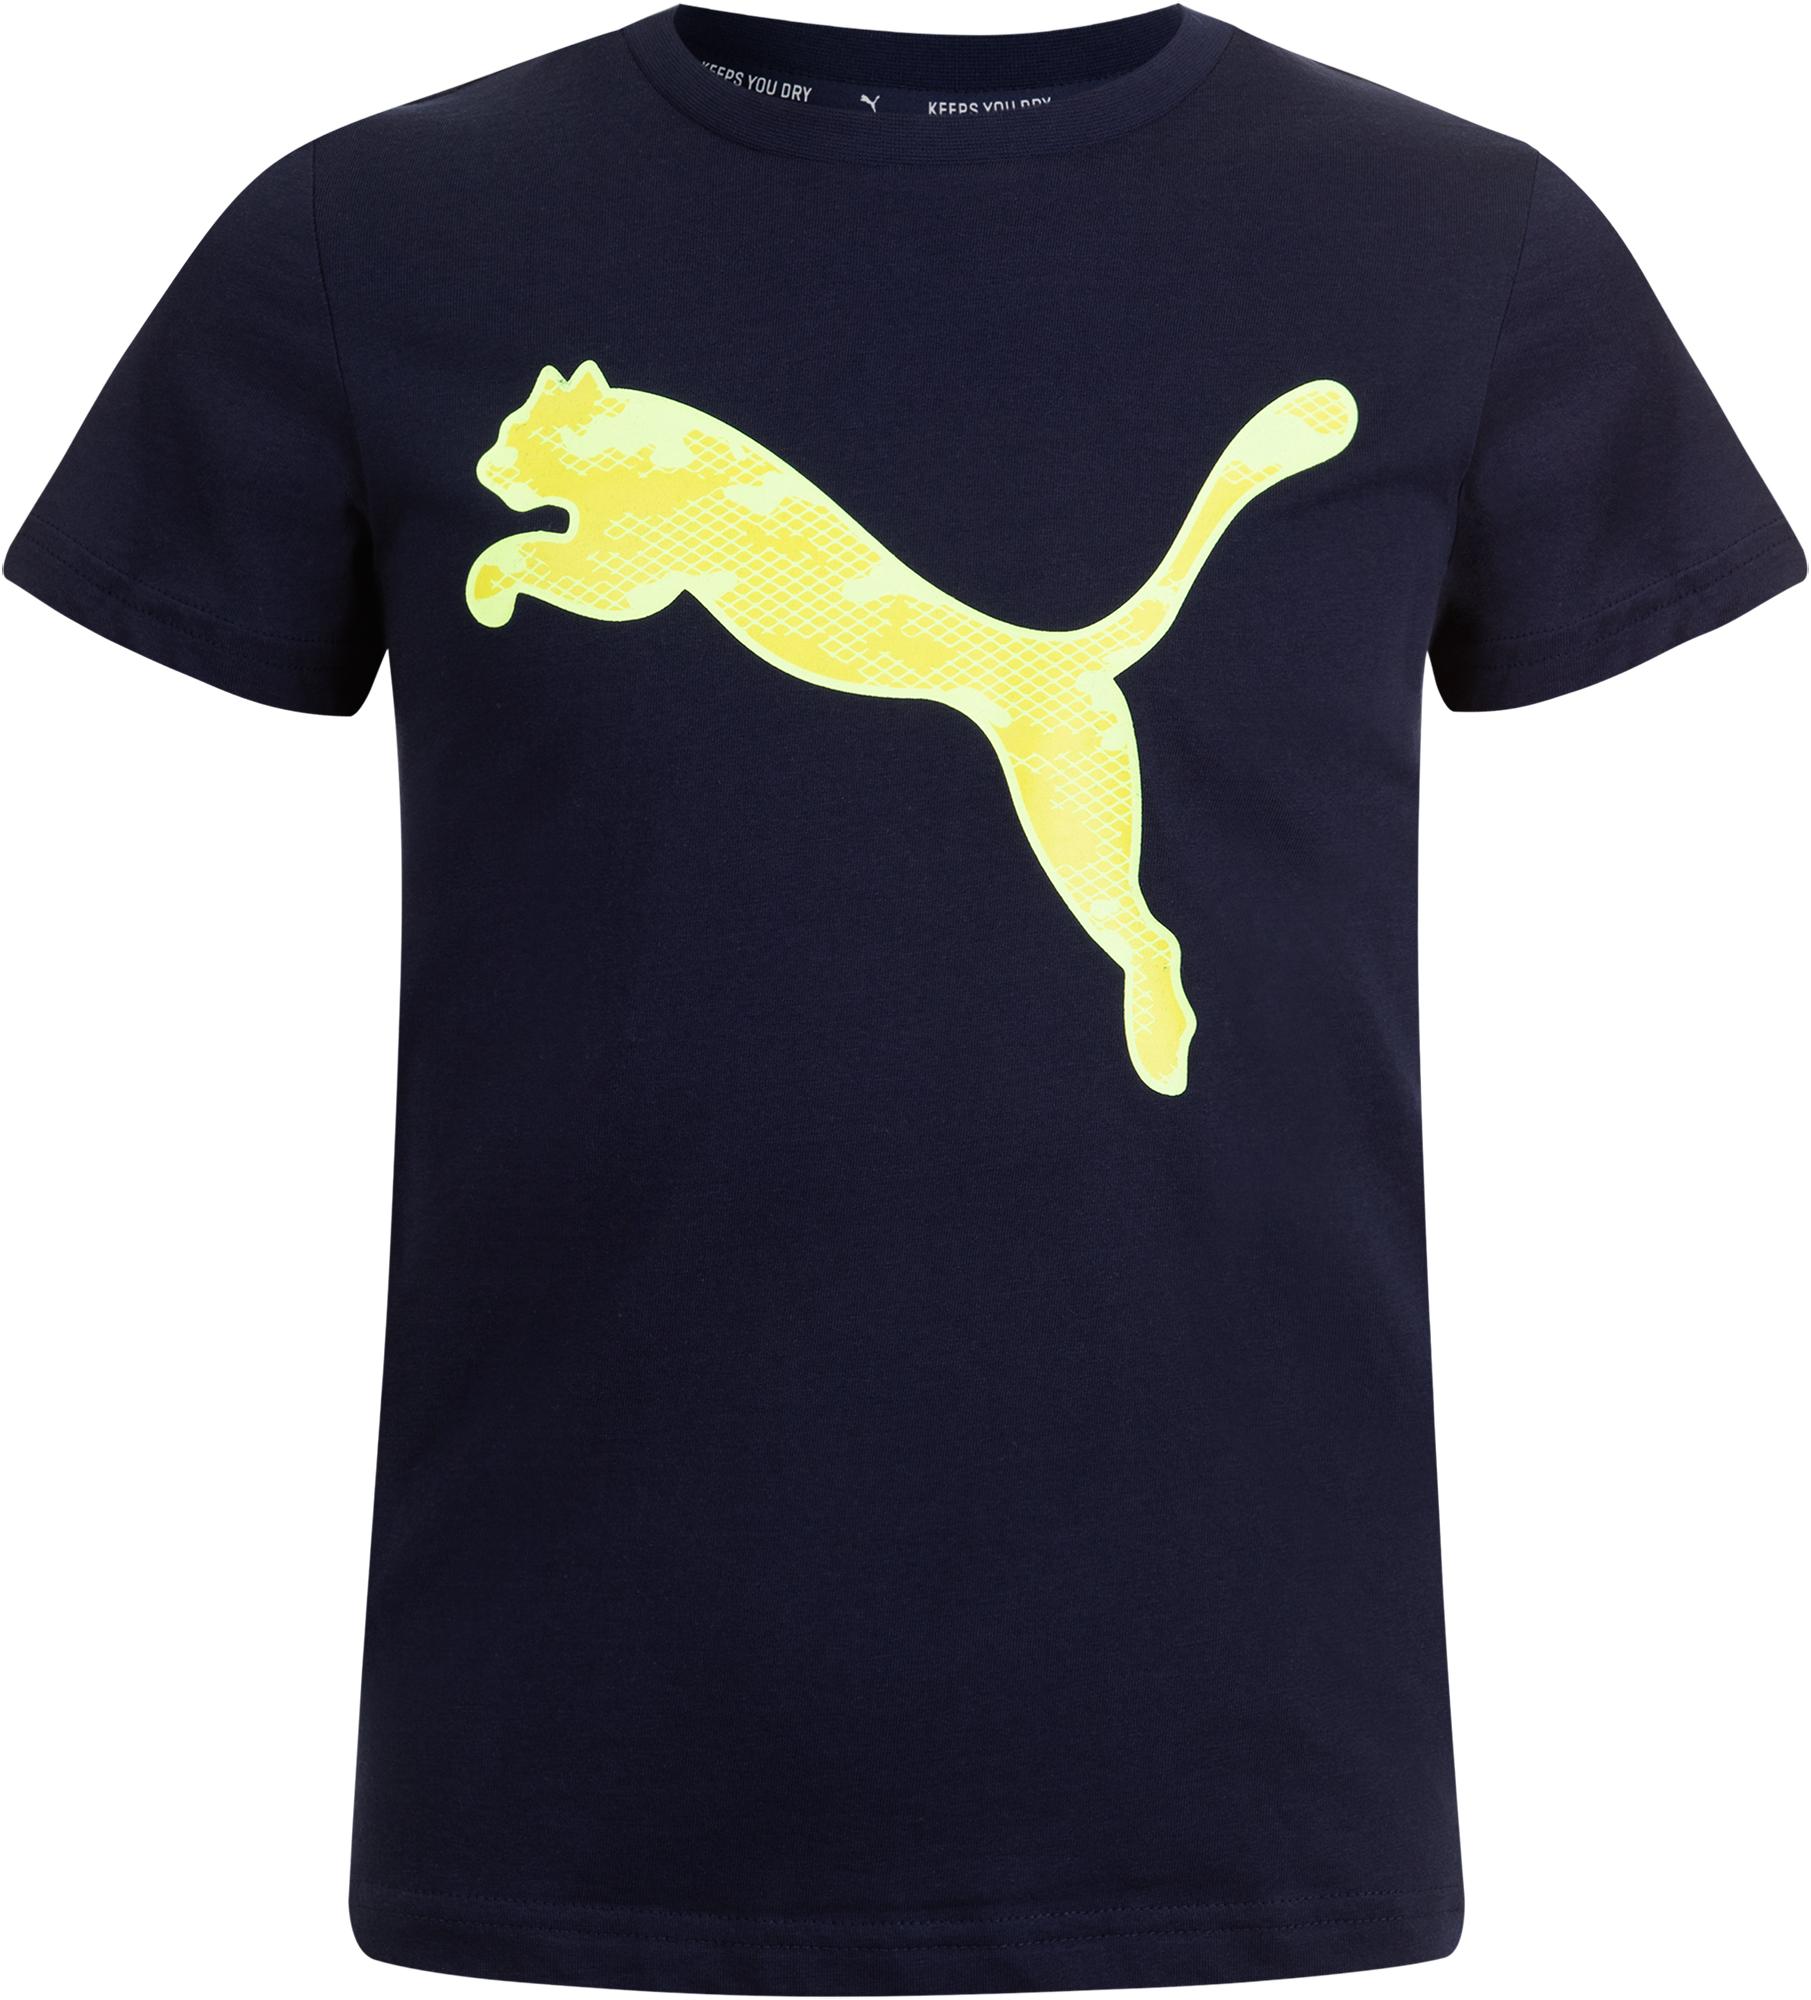 Puma Футболка для мальчиков Puma, размер 176